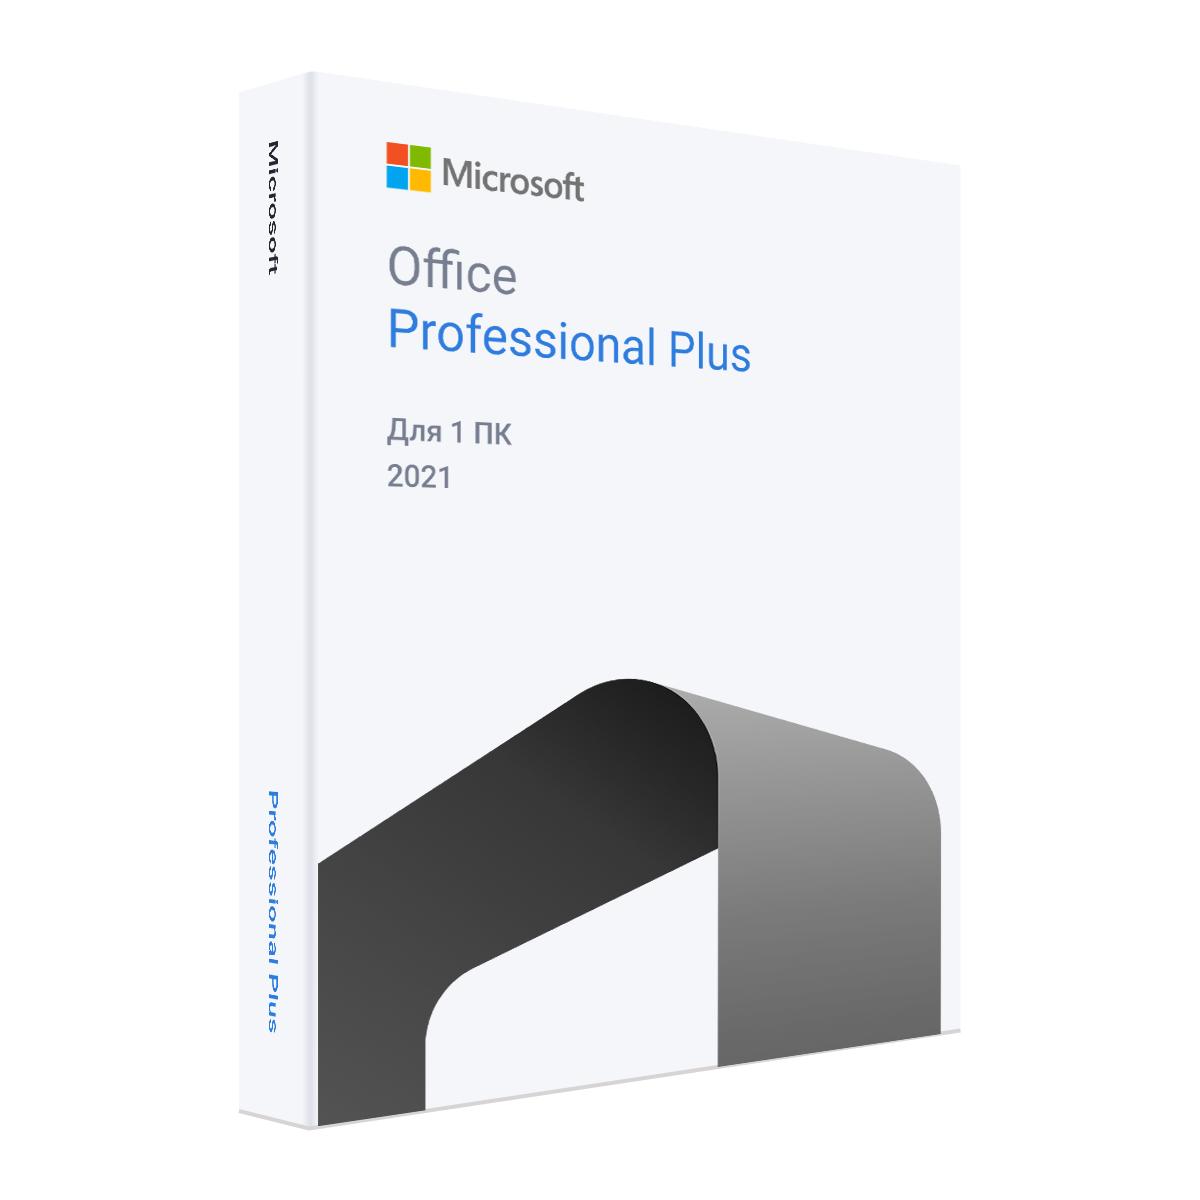 Office 2021 Professional Plus